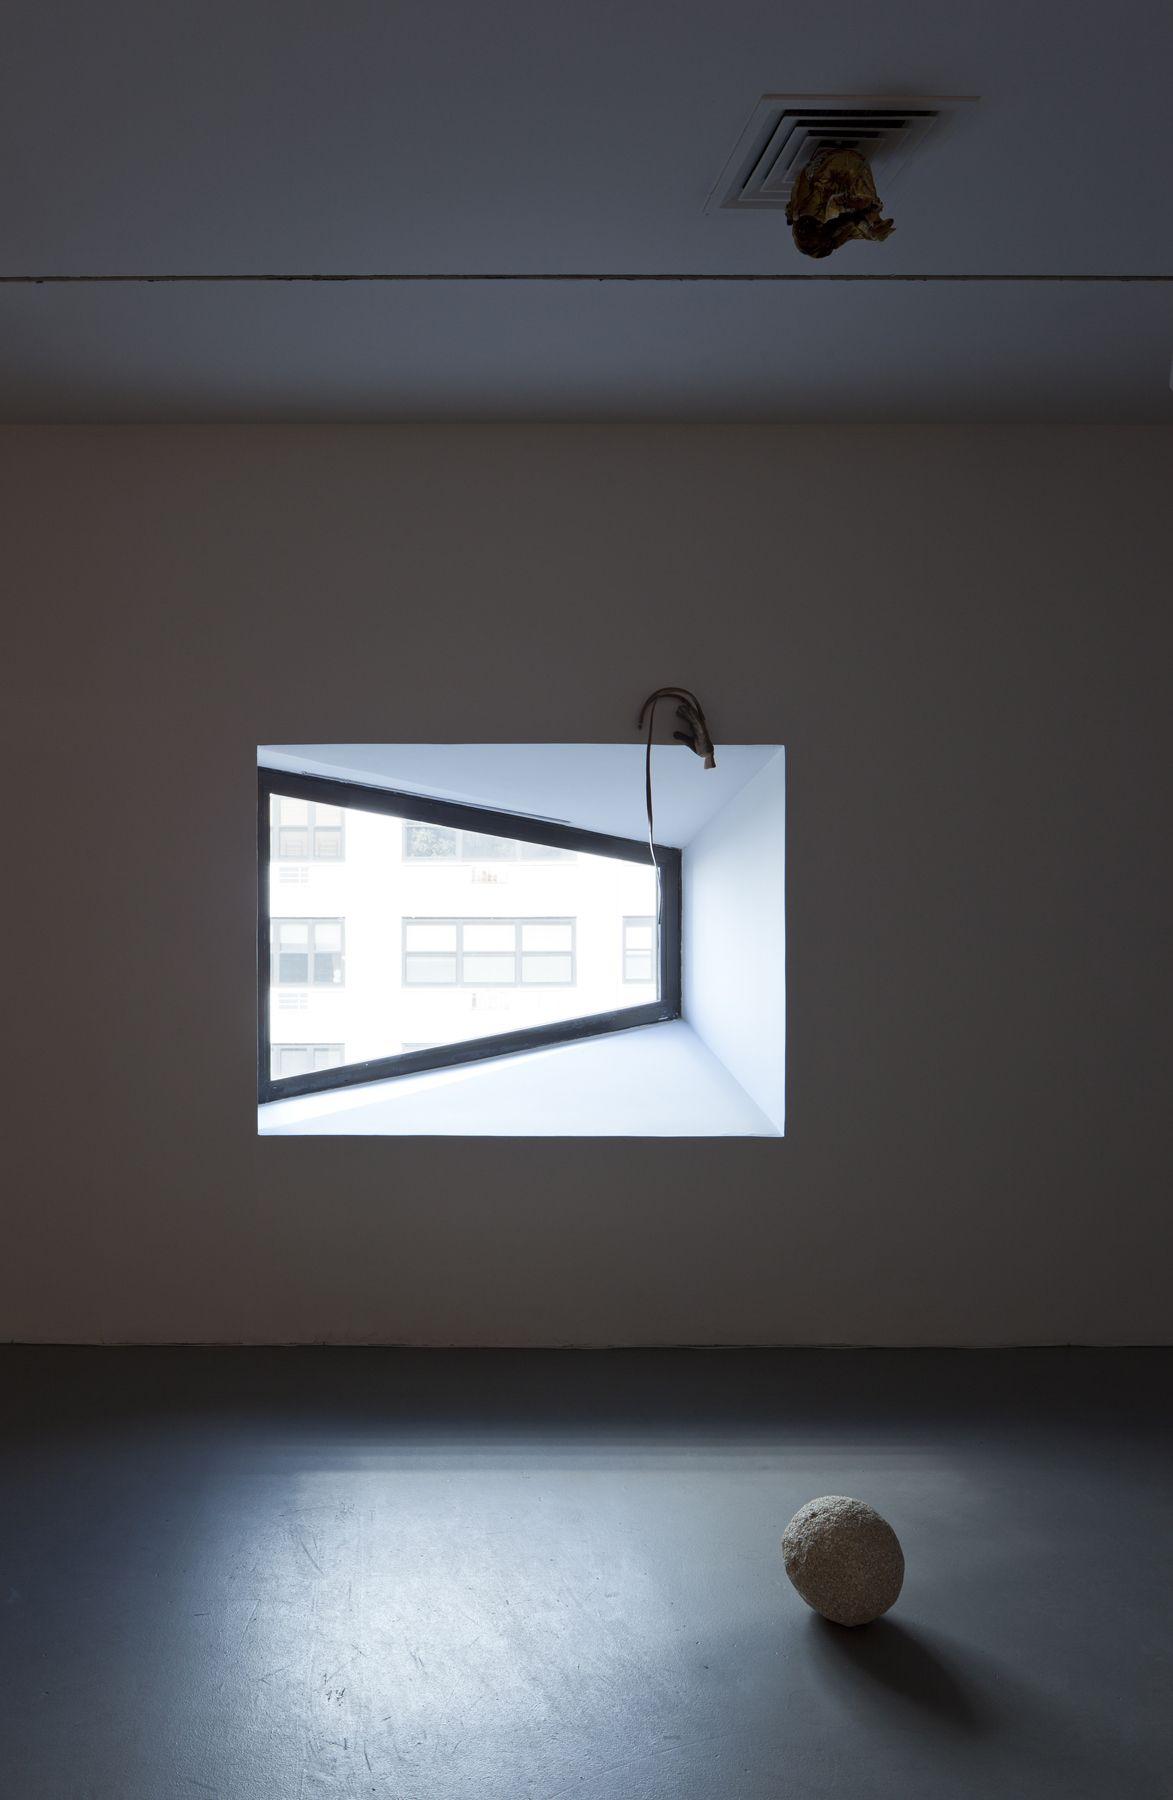 2012 Whitney Biennial, Whitney Museum of American Art, New York